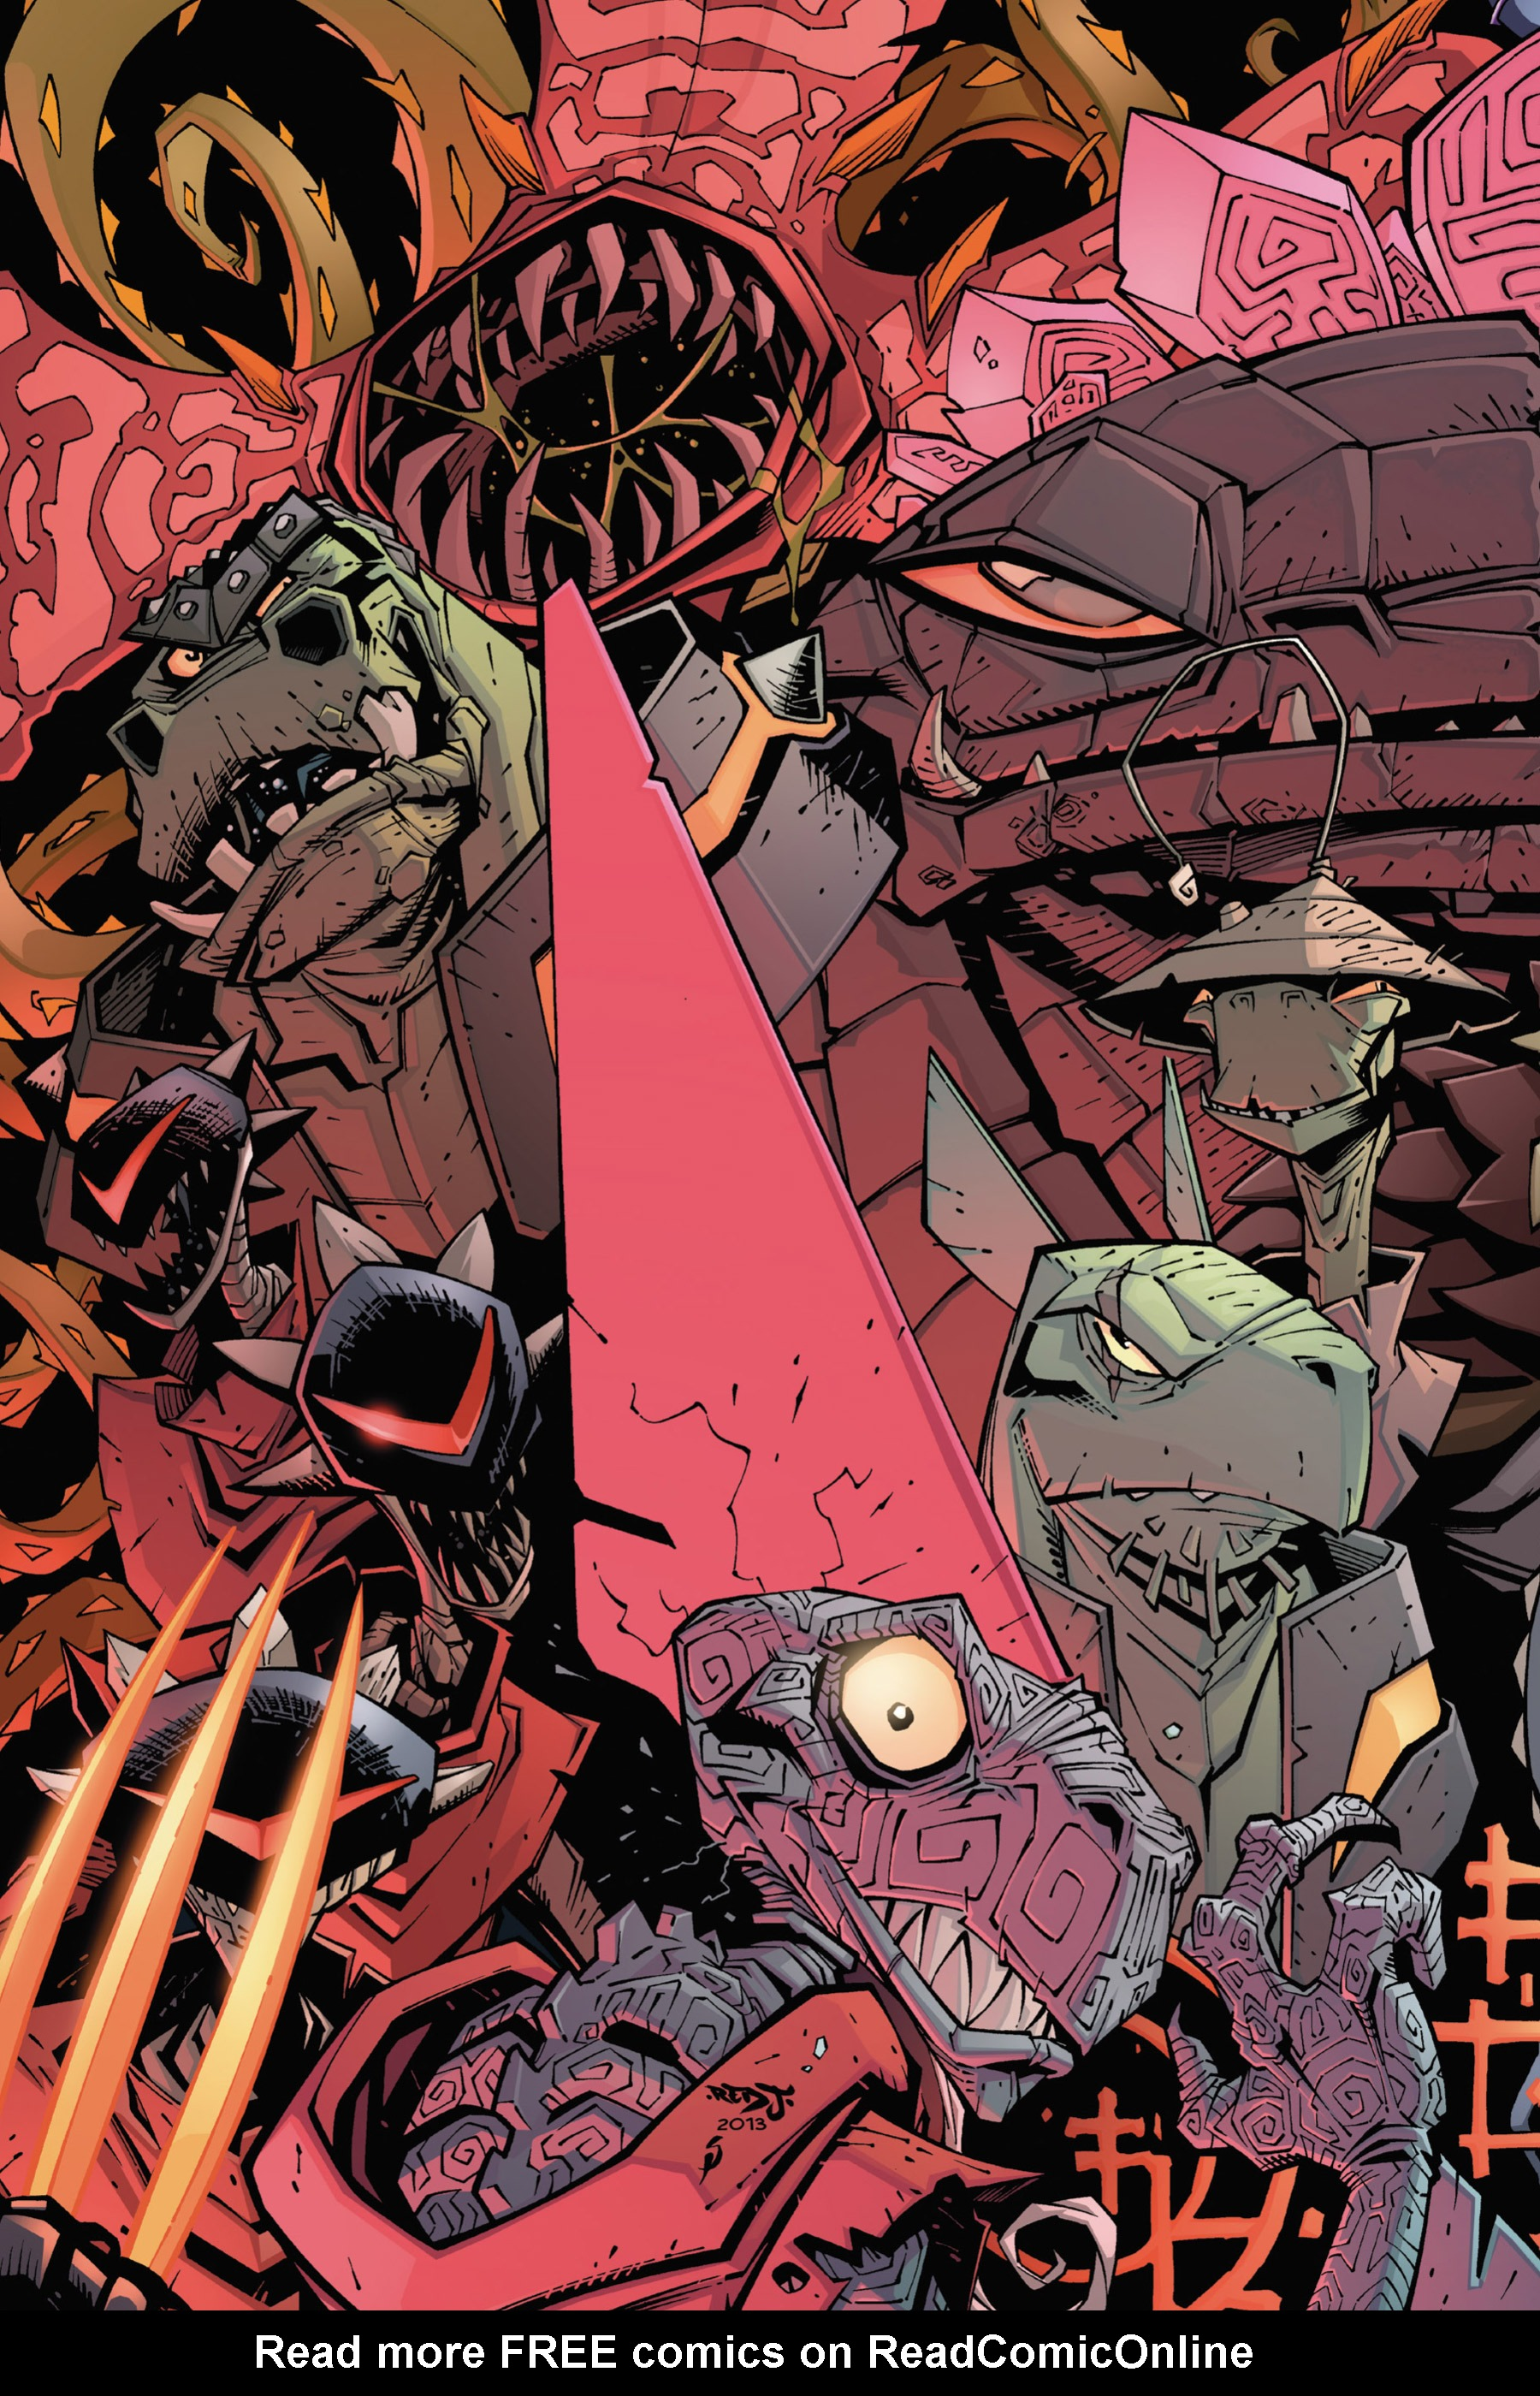 Read online Rexodus comic -  Issue # Full - 60